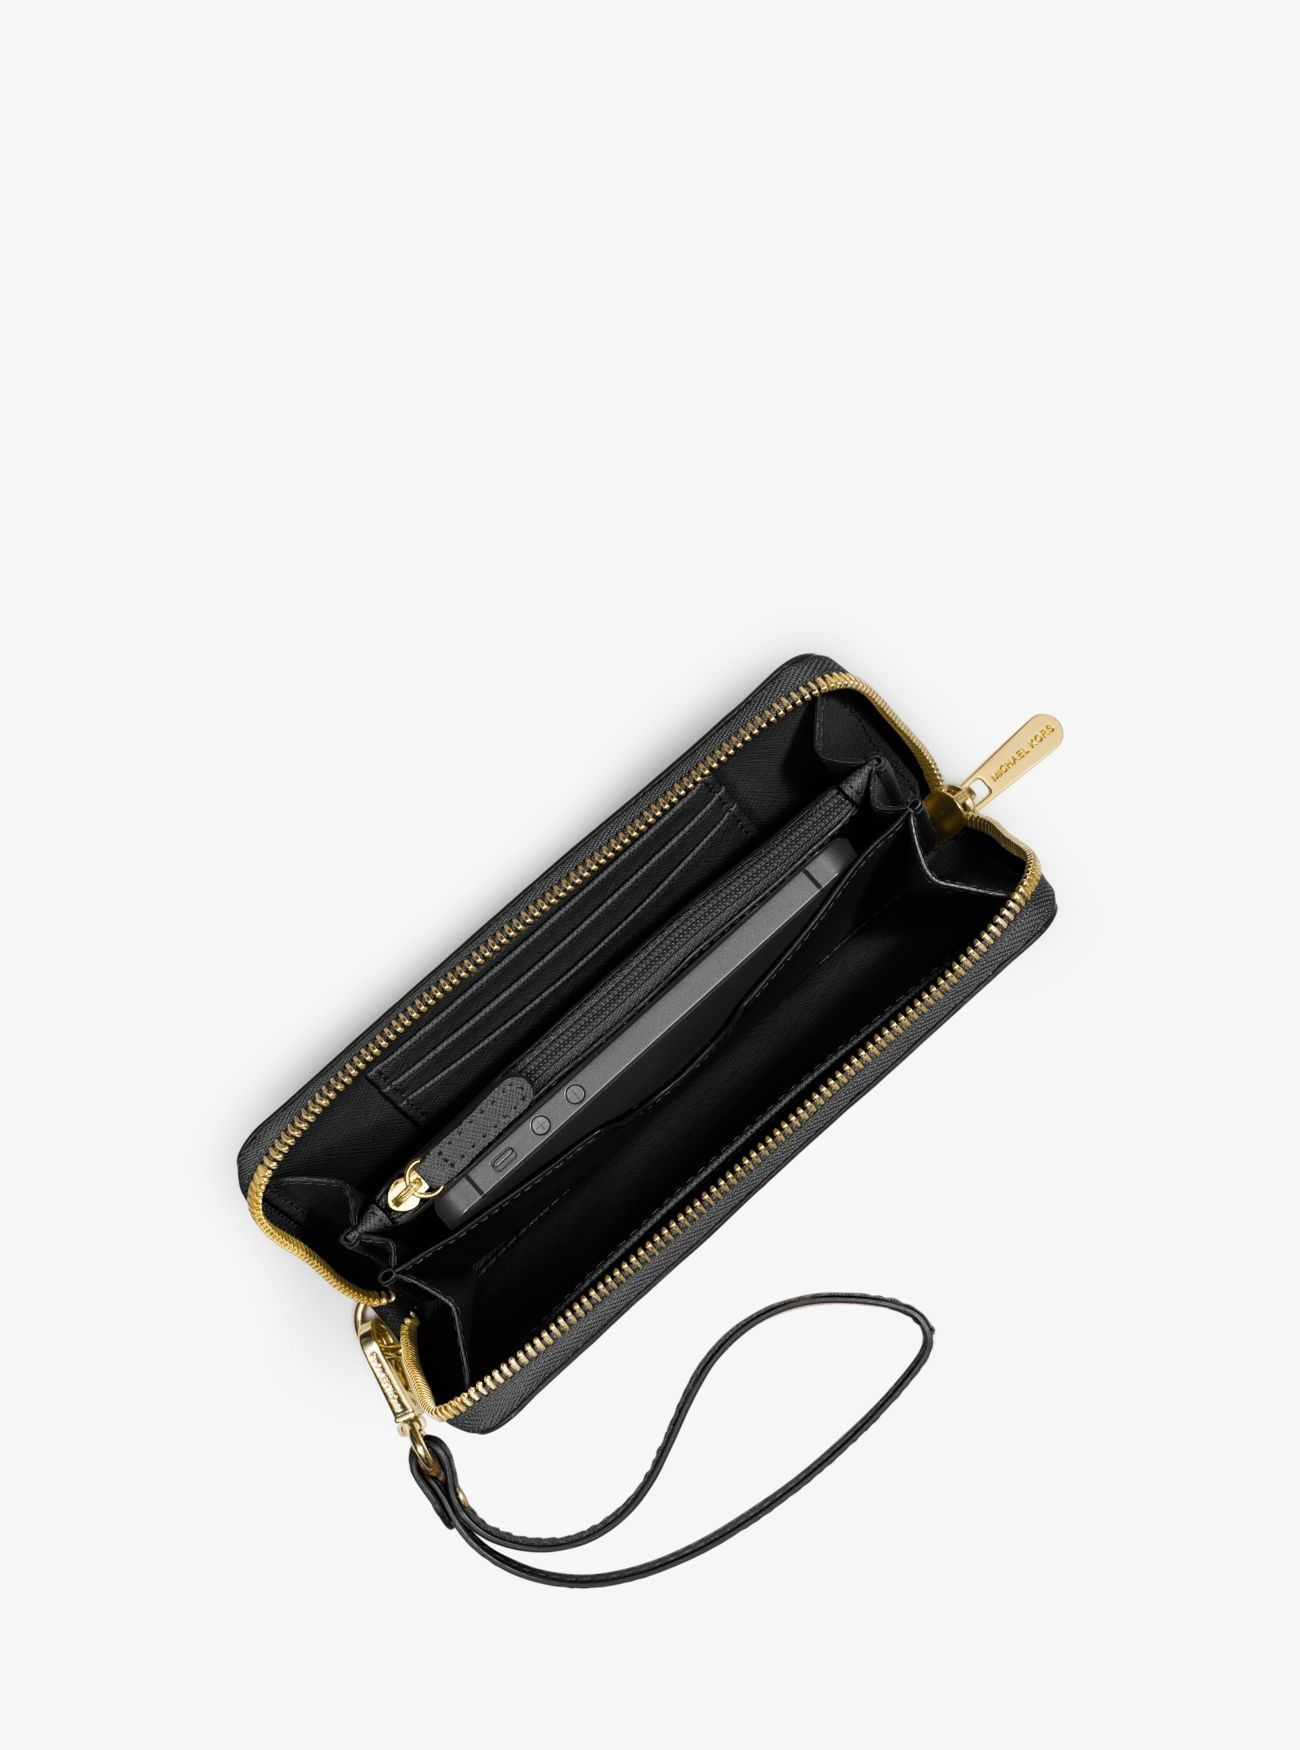 3b03d4e81f9a Online Michael Kors Black Jet Set Travel Large Smartphone Wristlet Stockist